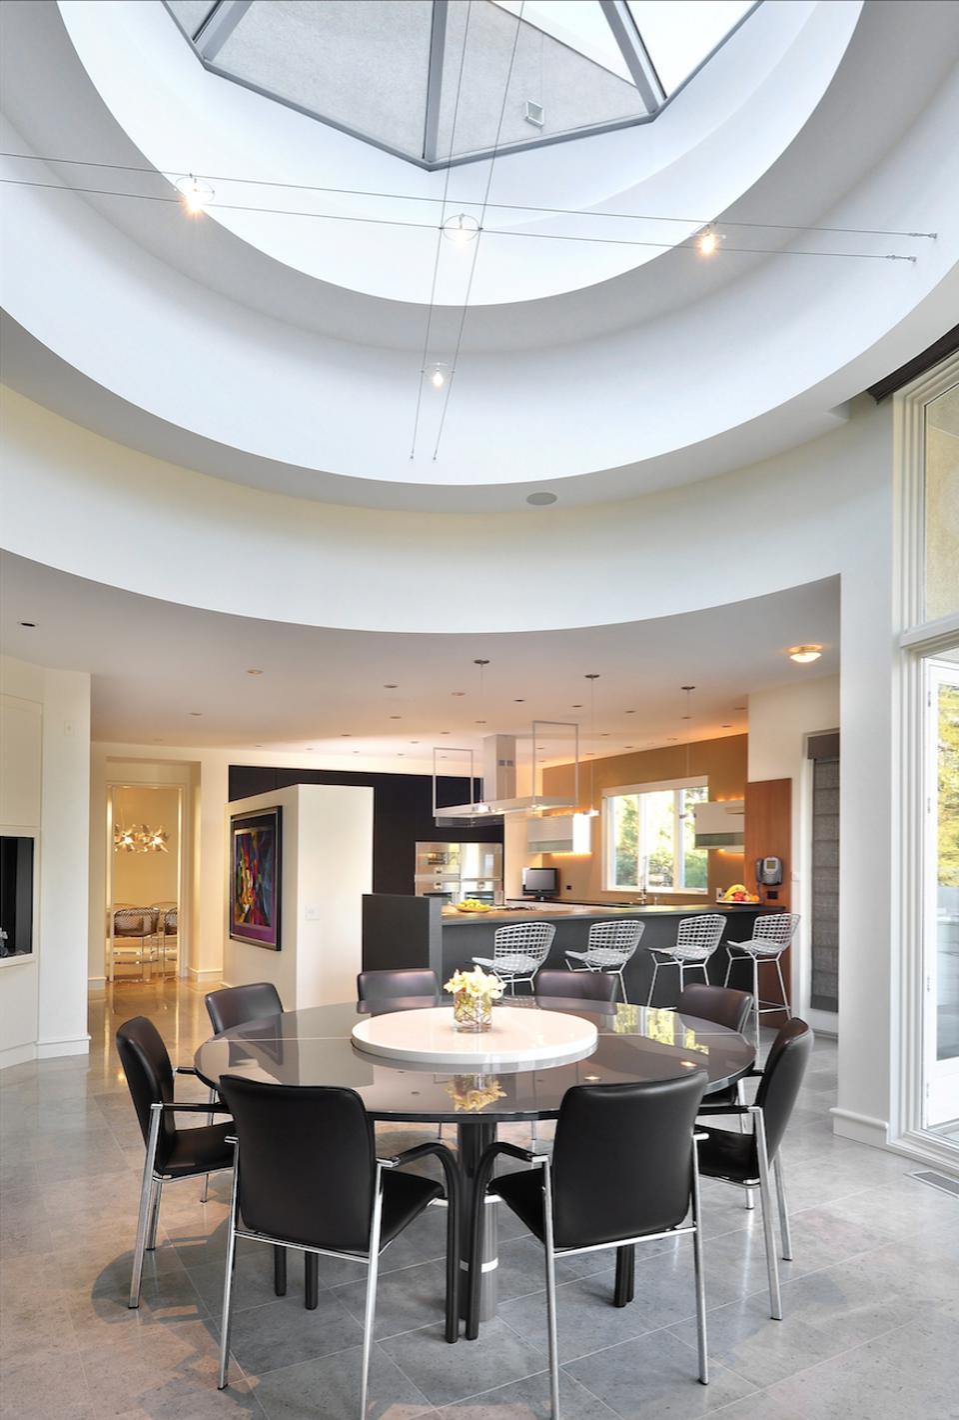 Breakfast room skylight